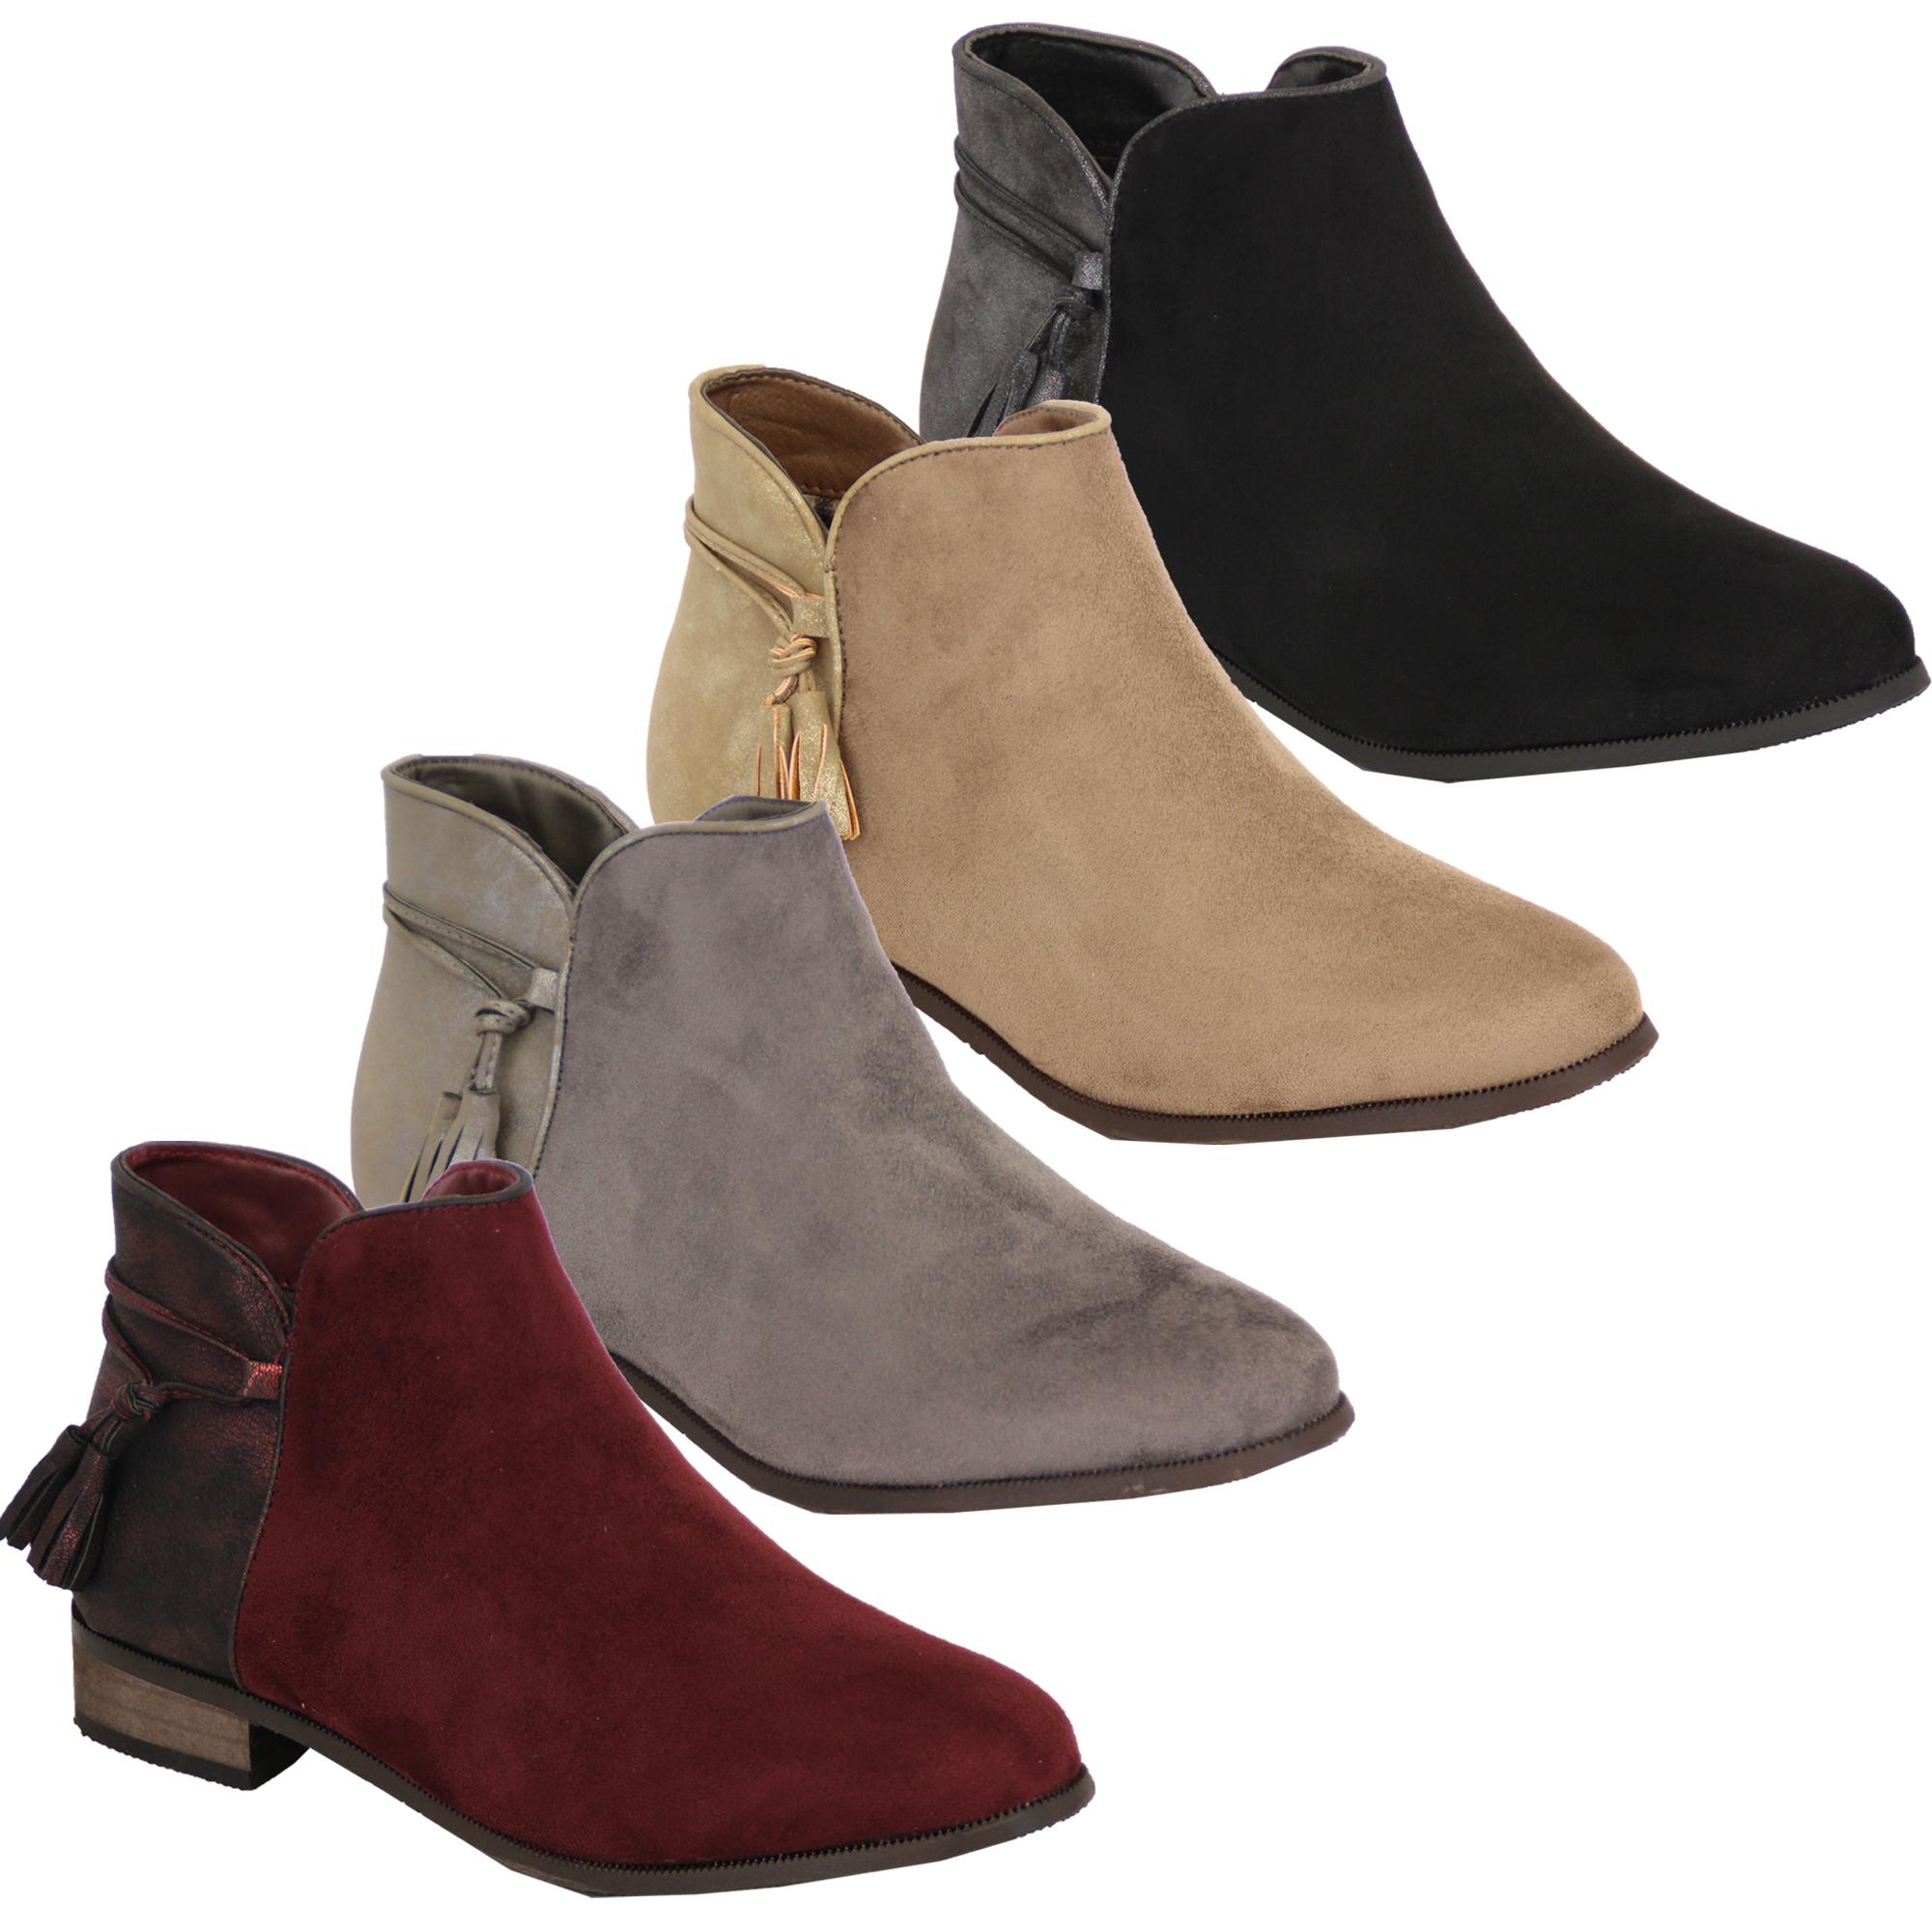 Damen Chelsea Stiefel Wildleder-Optik Schuhe Knöchel Reißverschluss Troddel